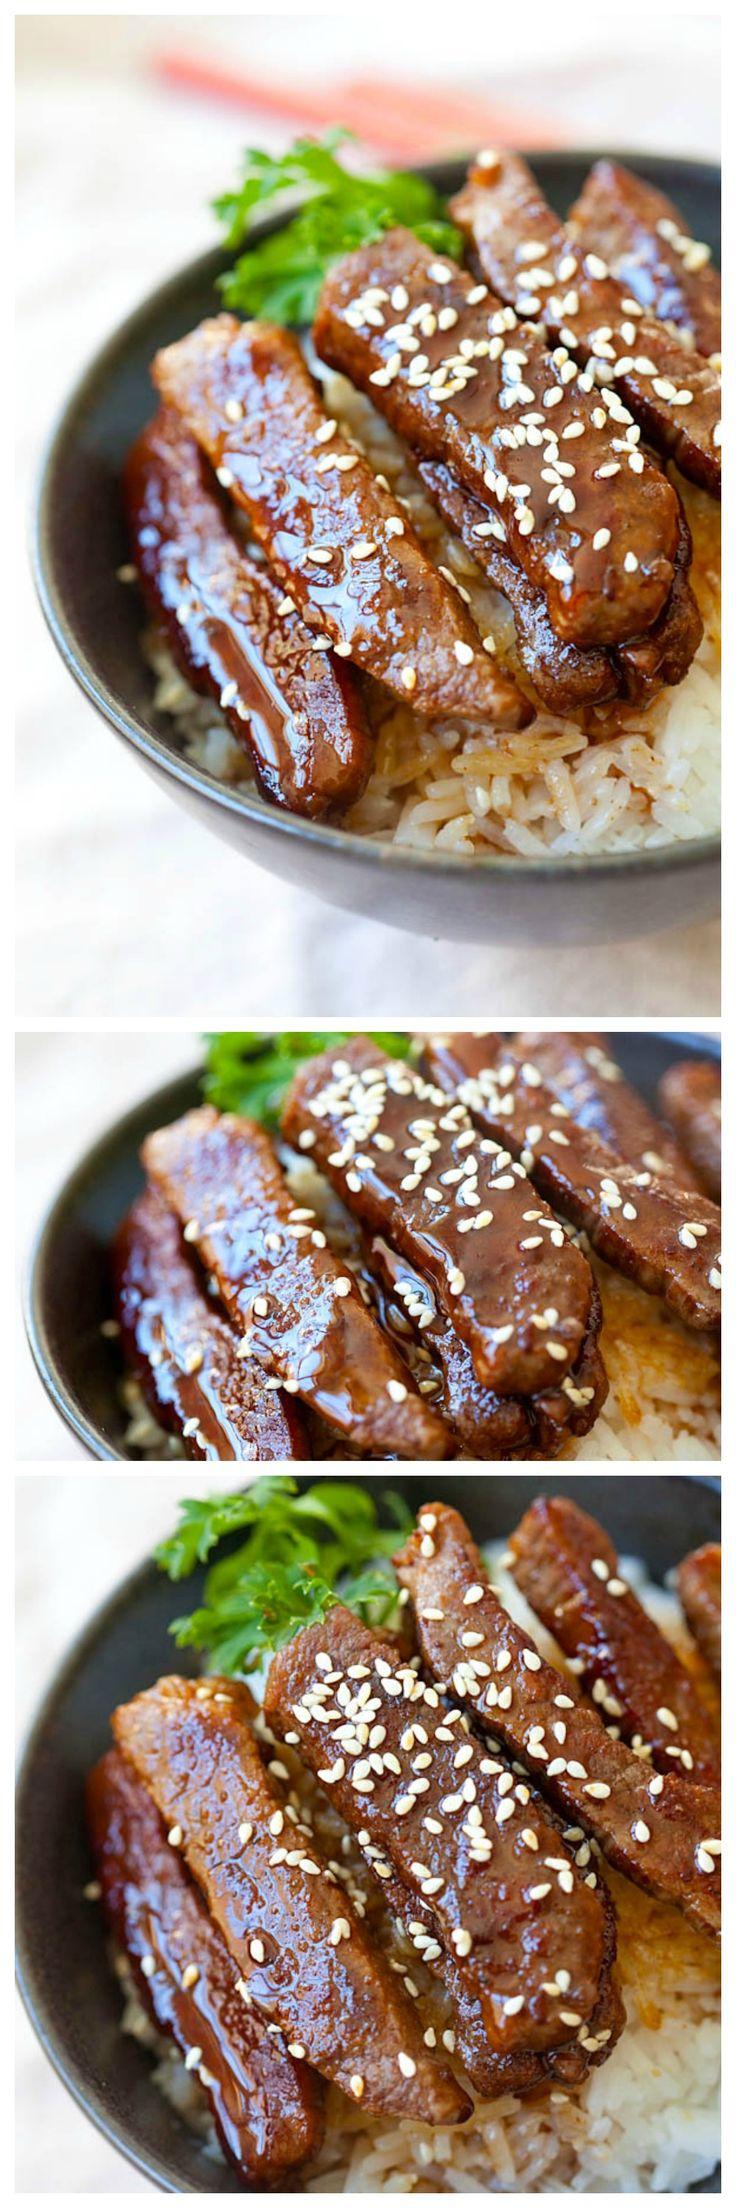 ... beef teriyaki with your favorite cut of beef and homemade teriyaki